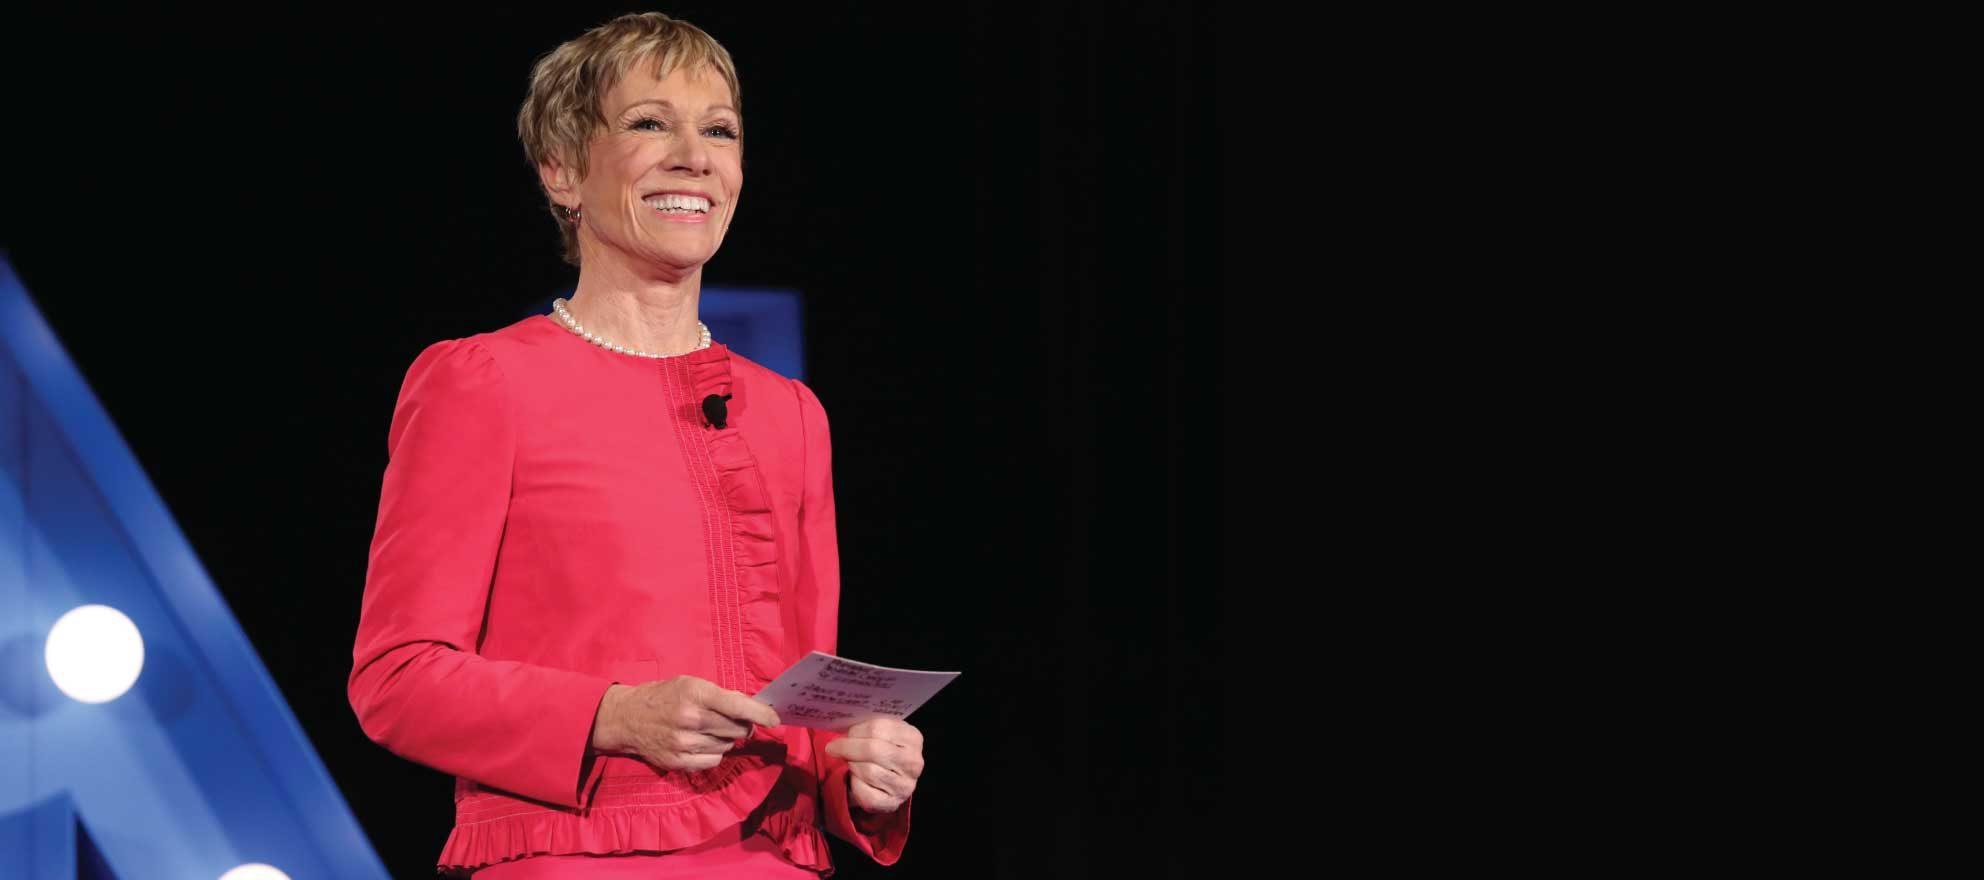 Barbara Corcoran on fire: Watch the video